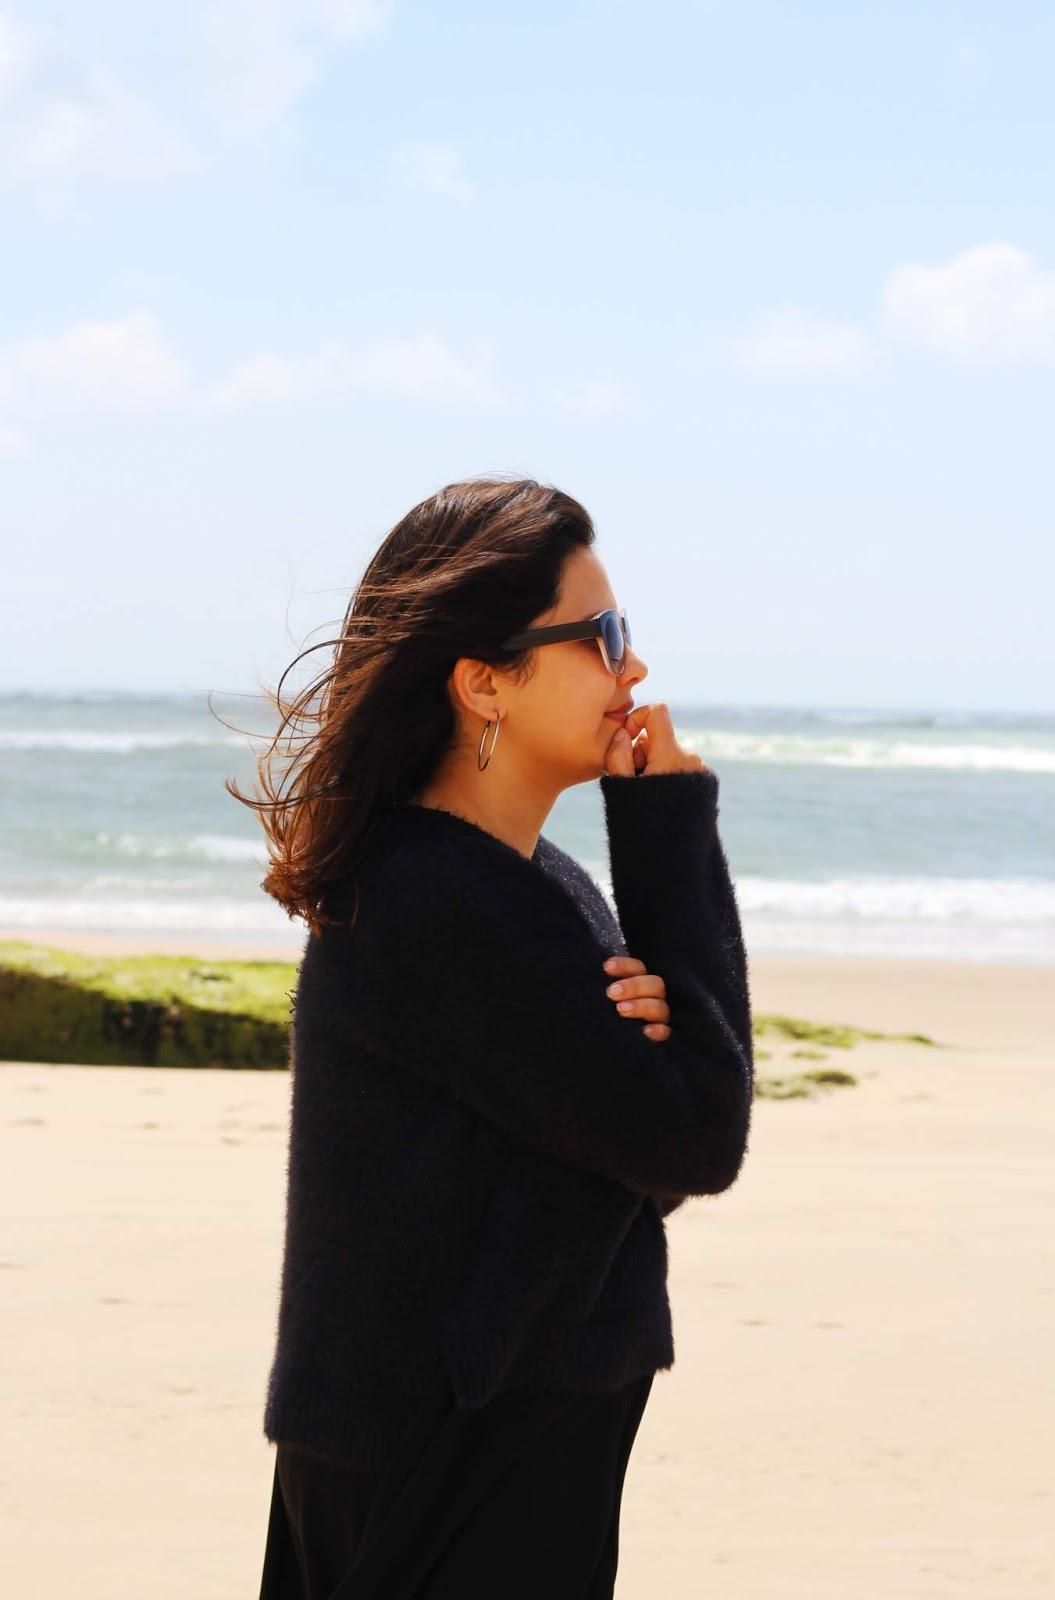 blogger pensativa